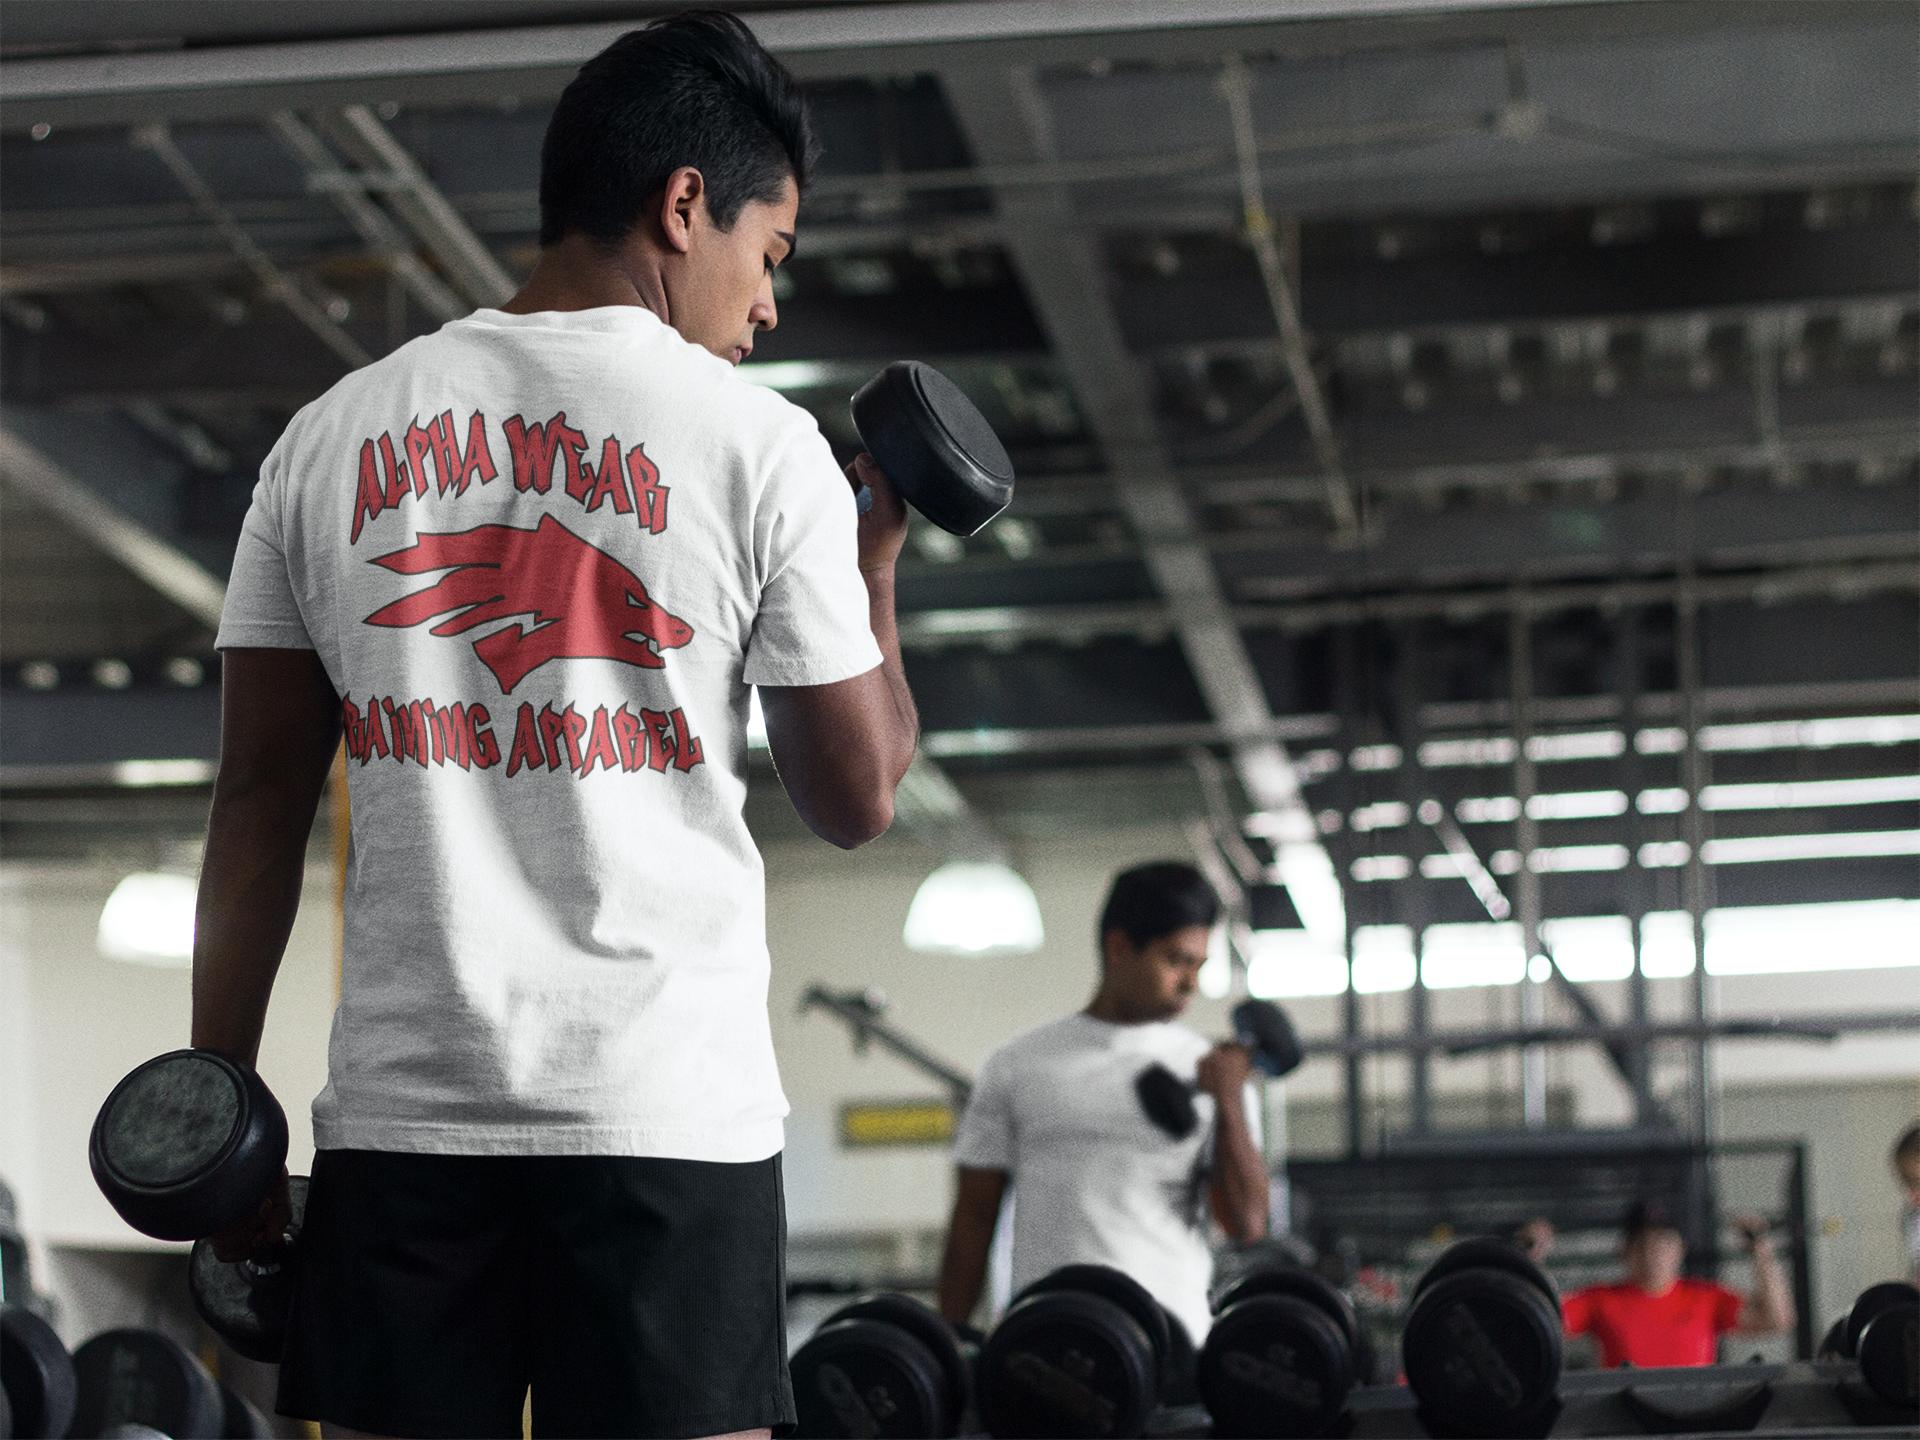 man-at-the-gym-lifting-weights-t-shirt-m